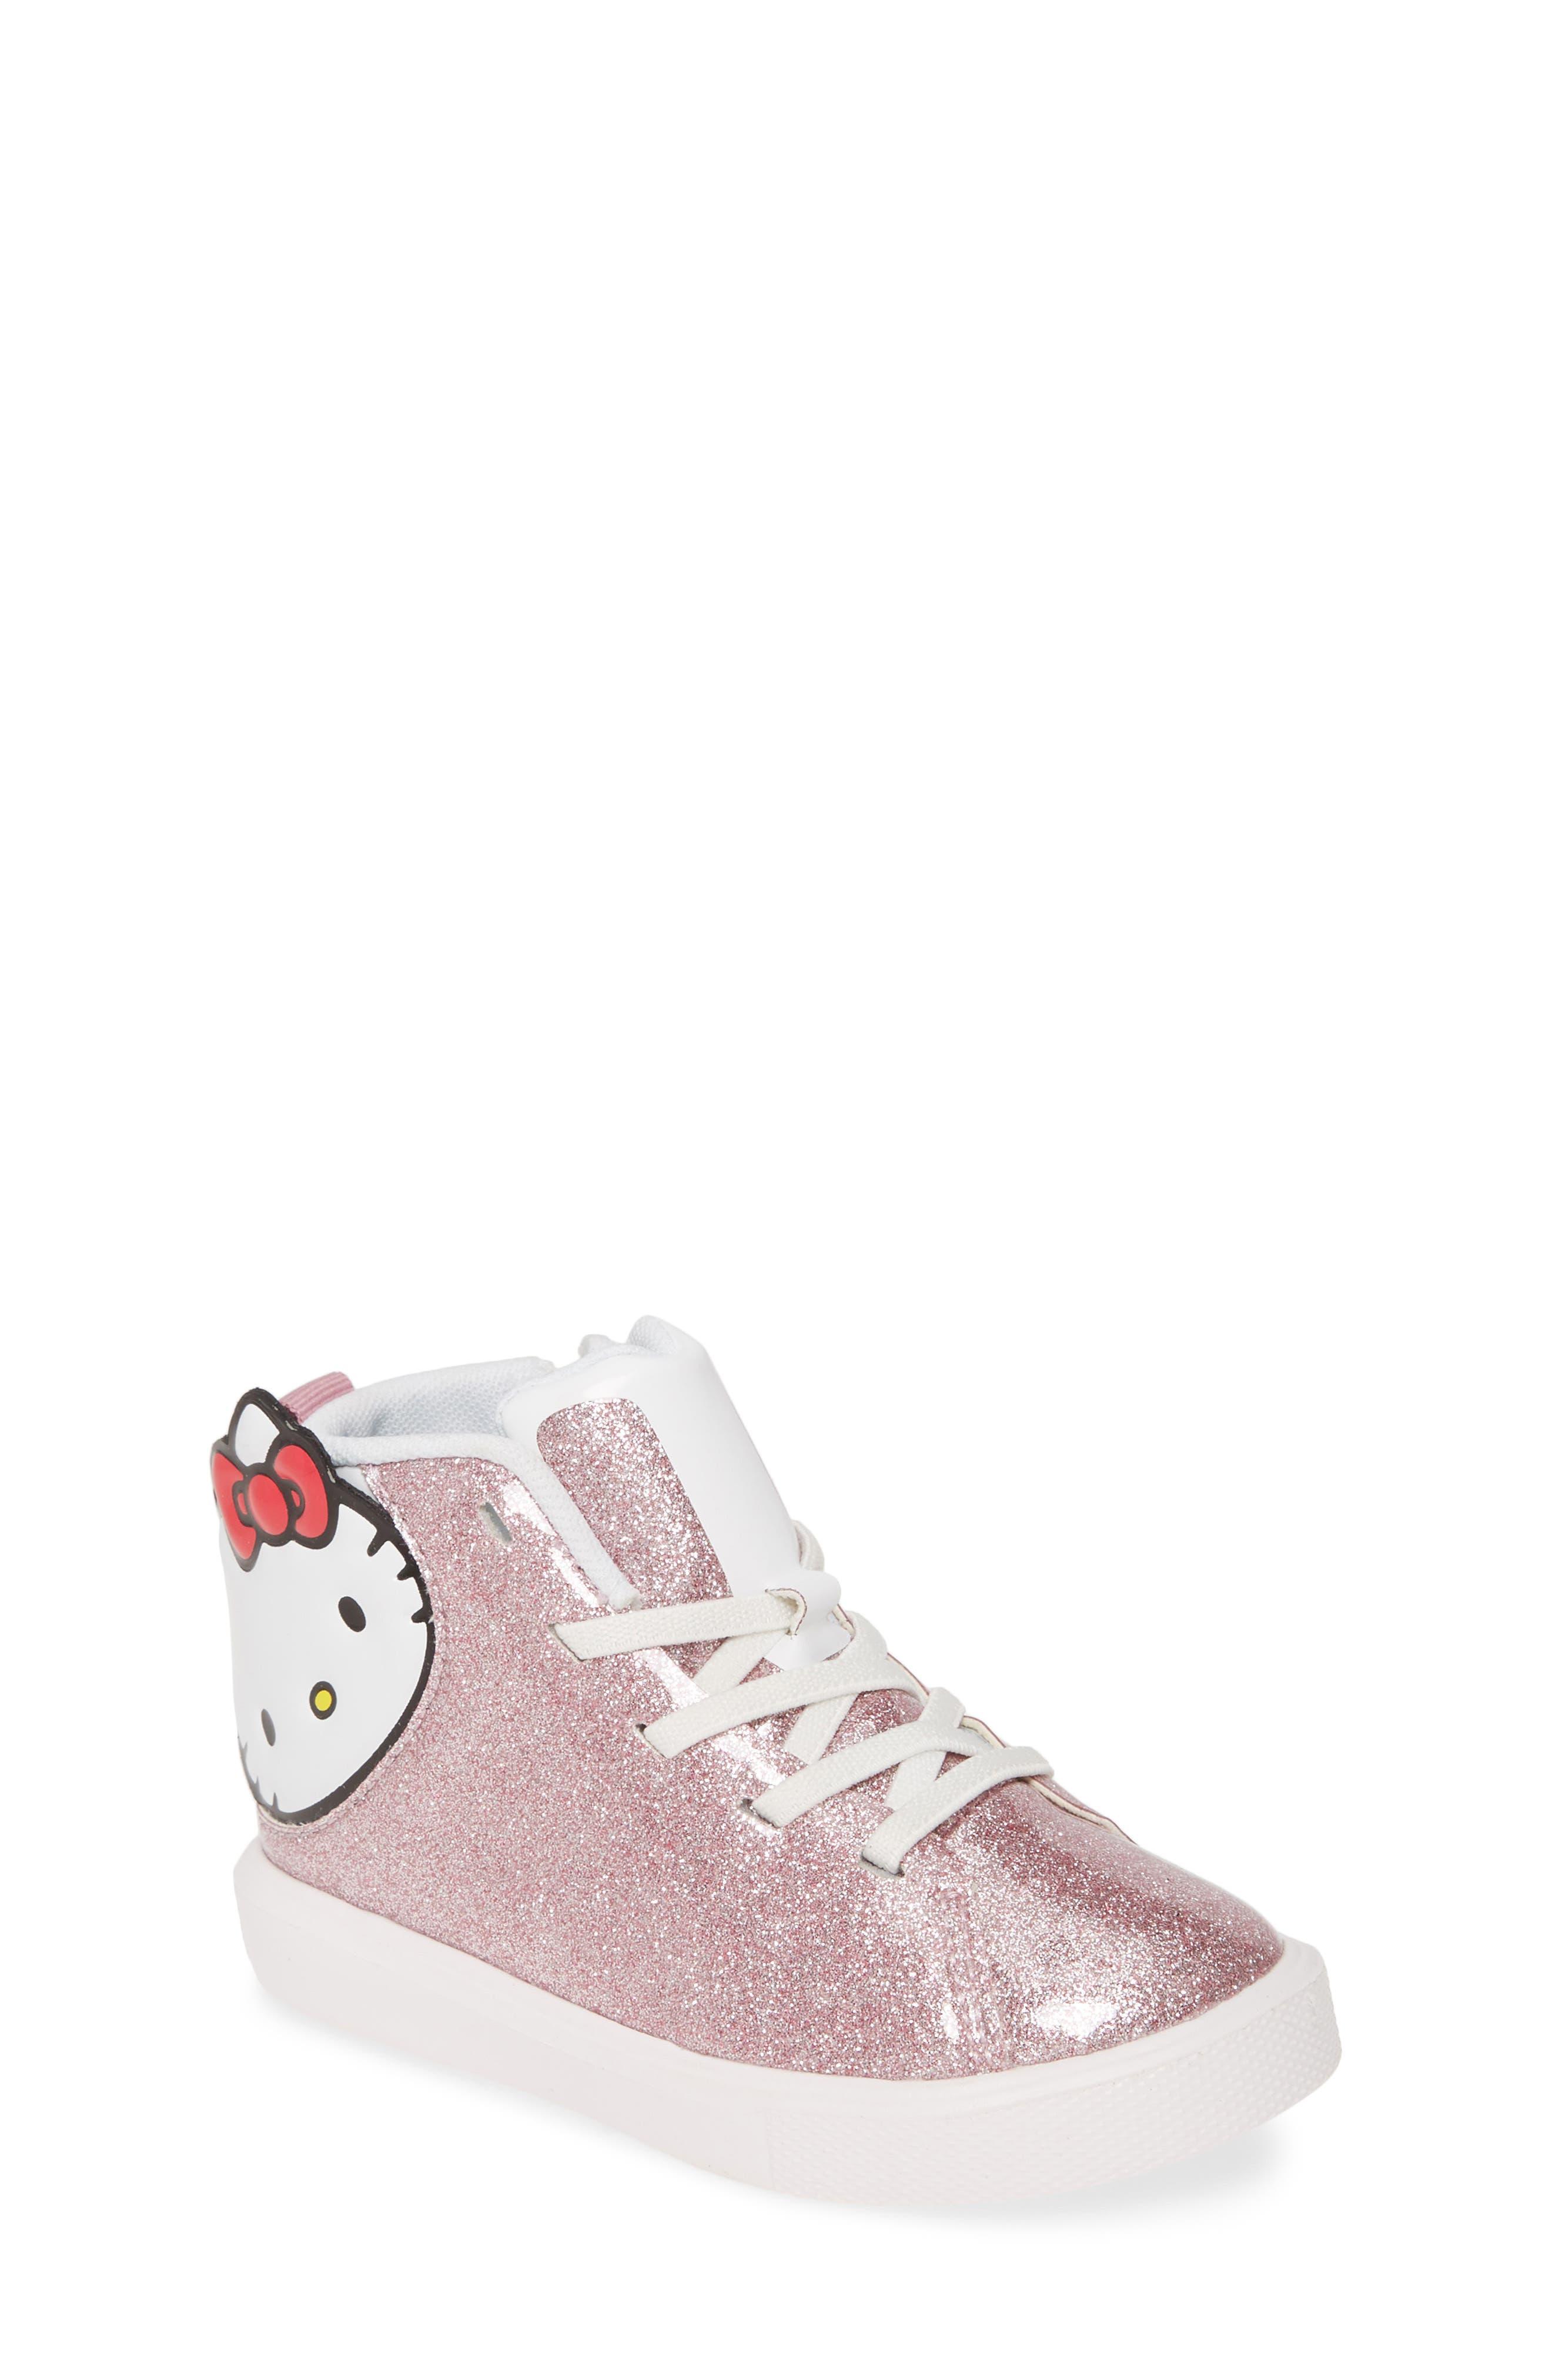 Toddler Girls Native Shoes Monaco Hello Kitty Glitter Sneaker Size 7 M  Red